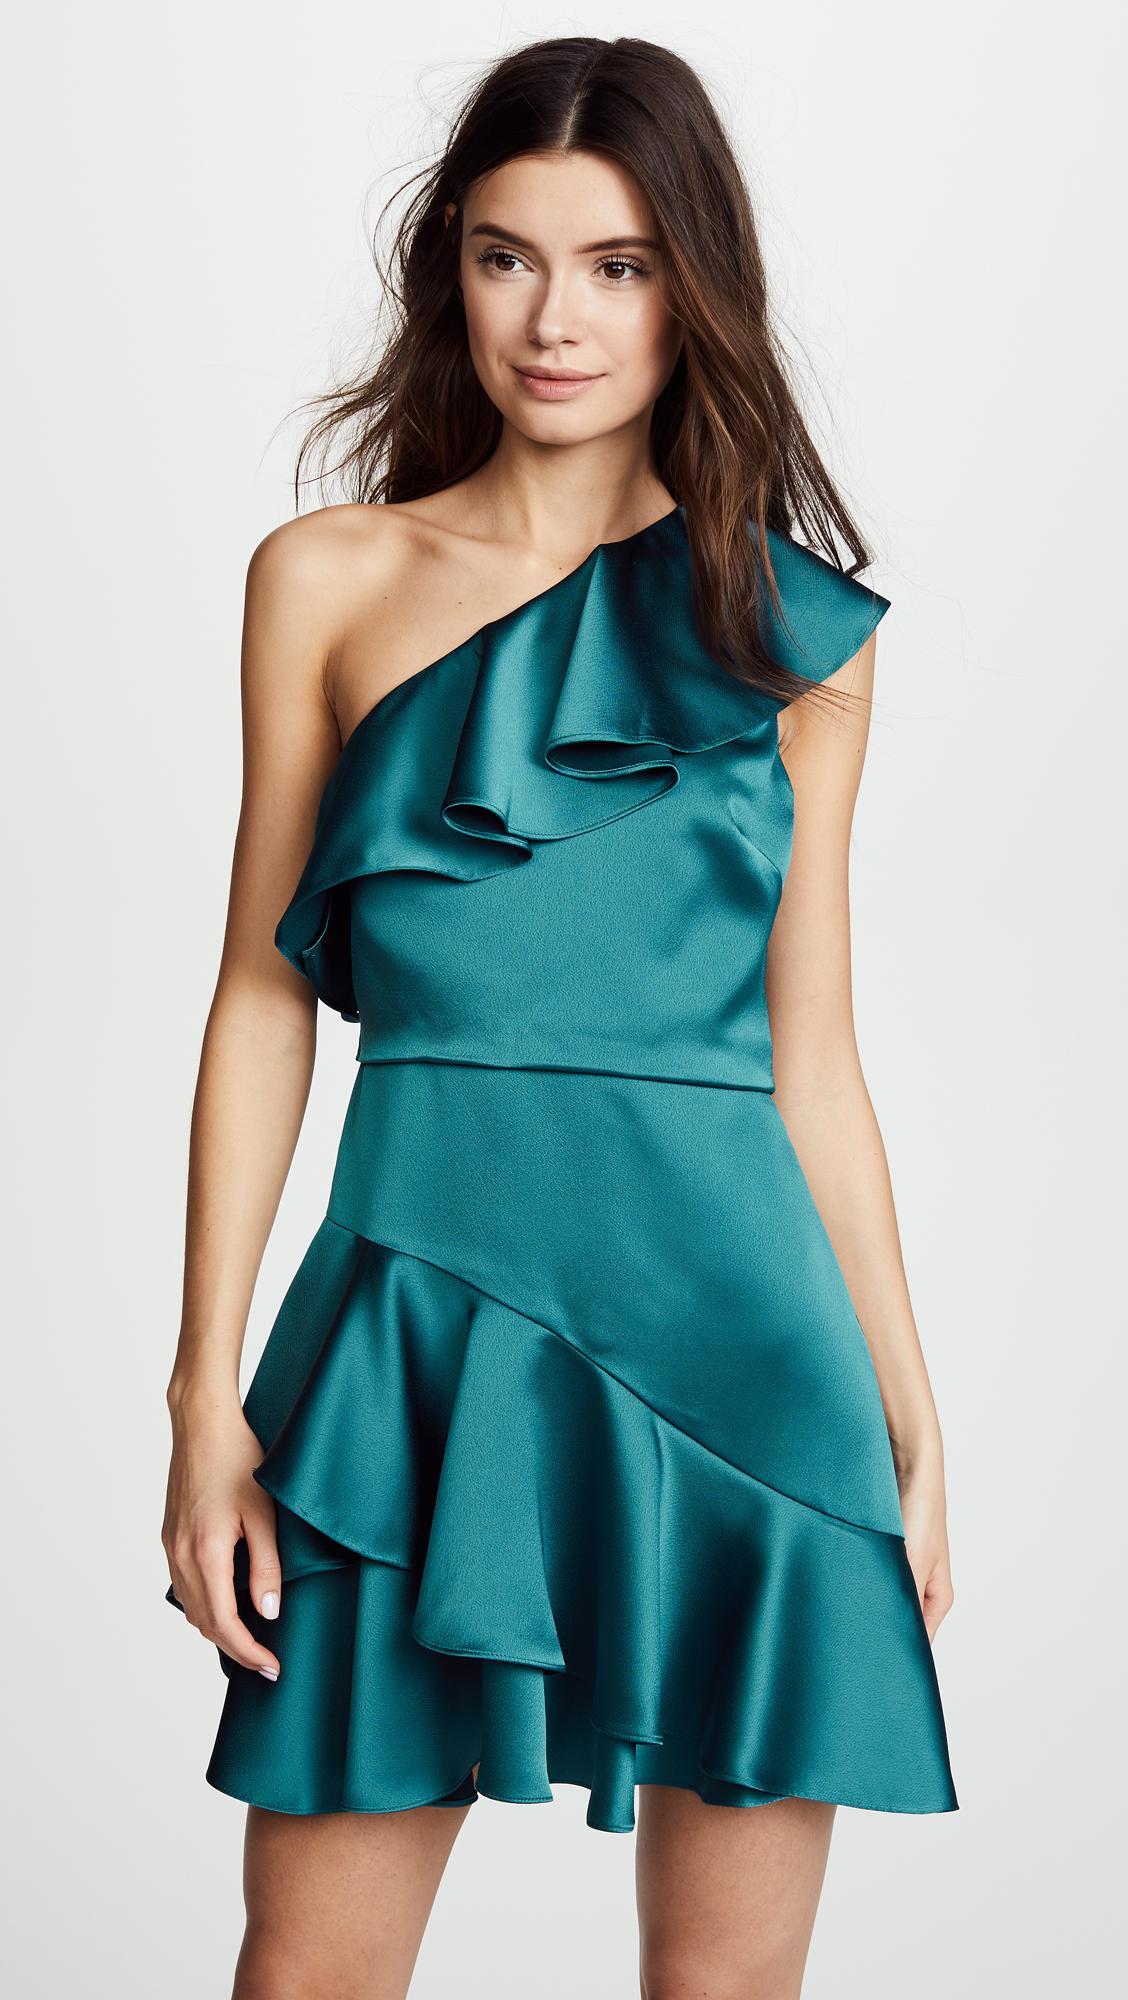 Lyst - Halston Heritage One Shoulder Flounce Dress in Blue